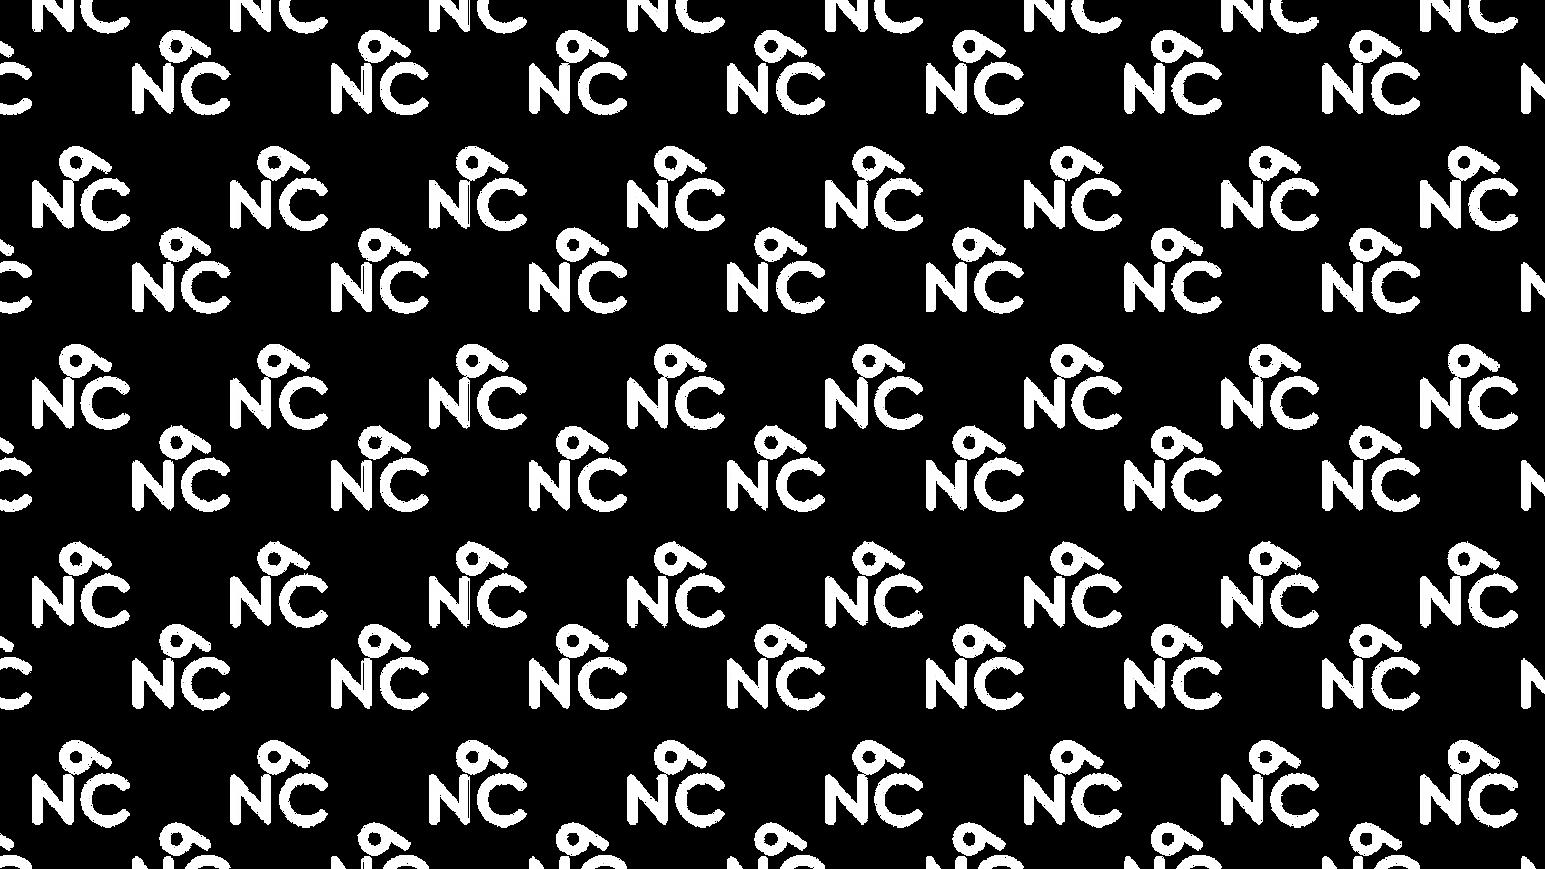 NC pattern.png